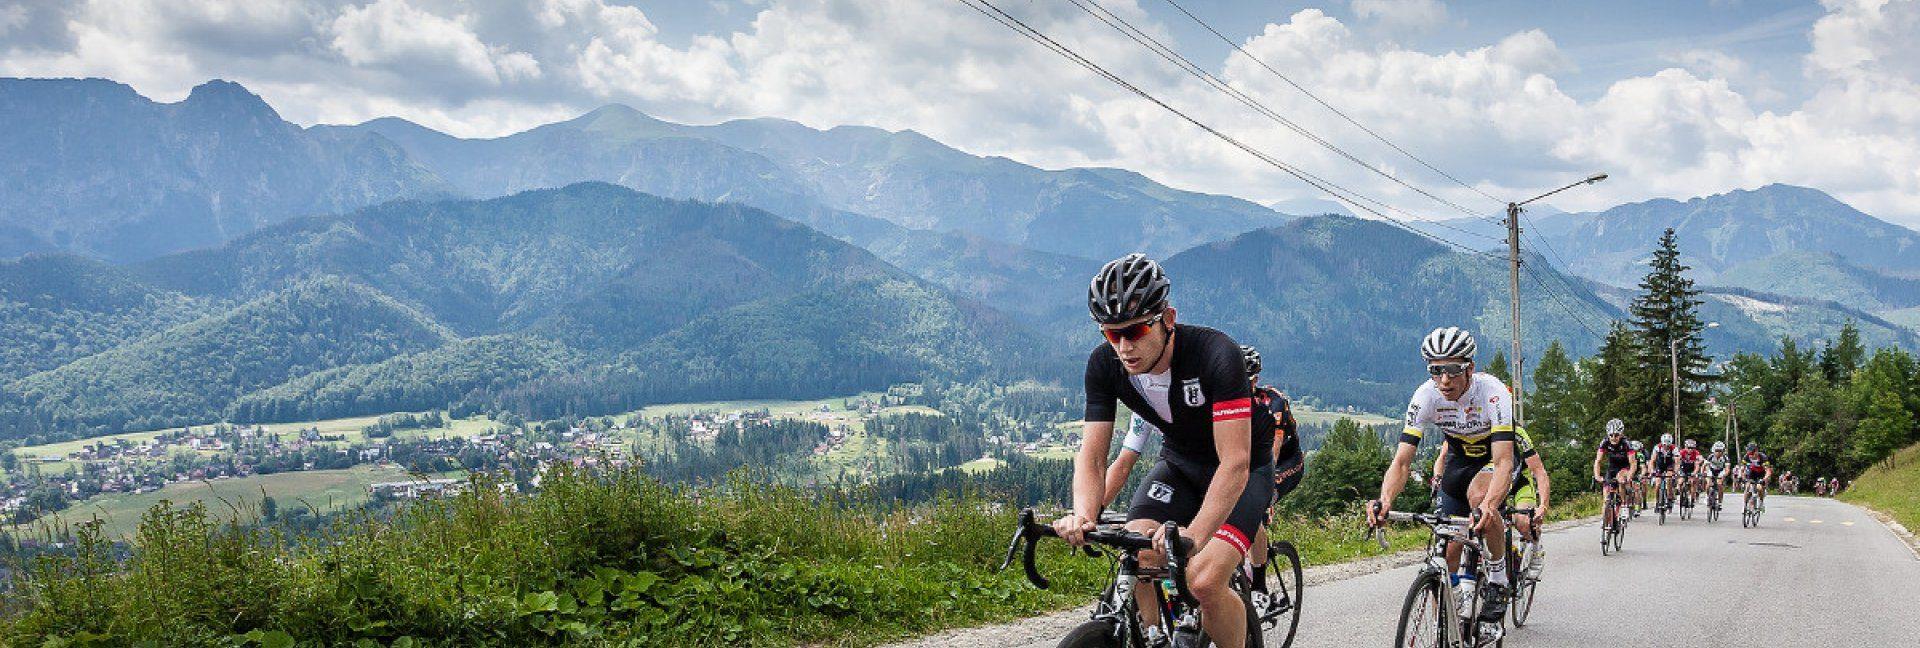 Tatra Road Race 2018